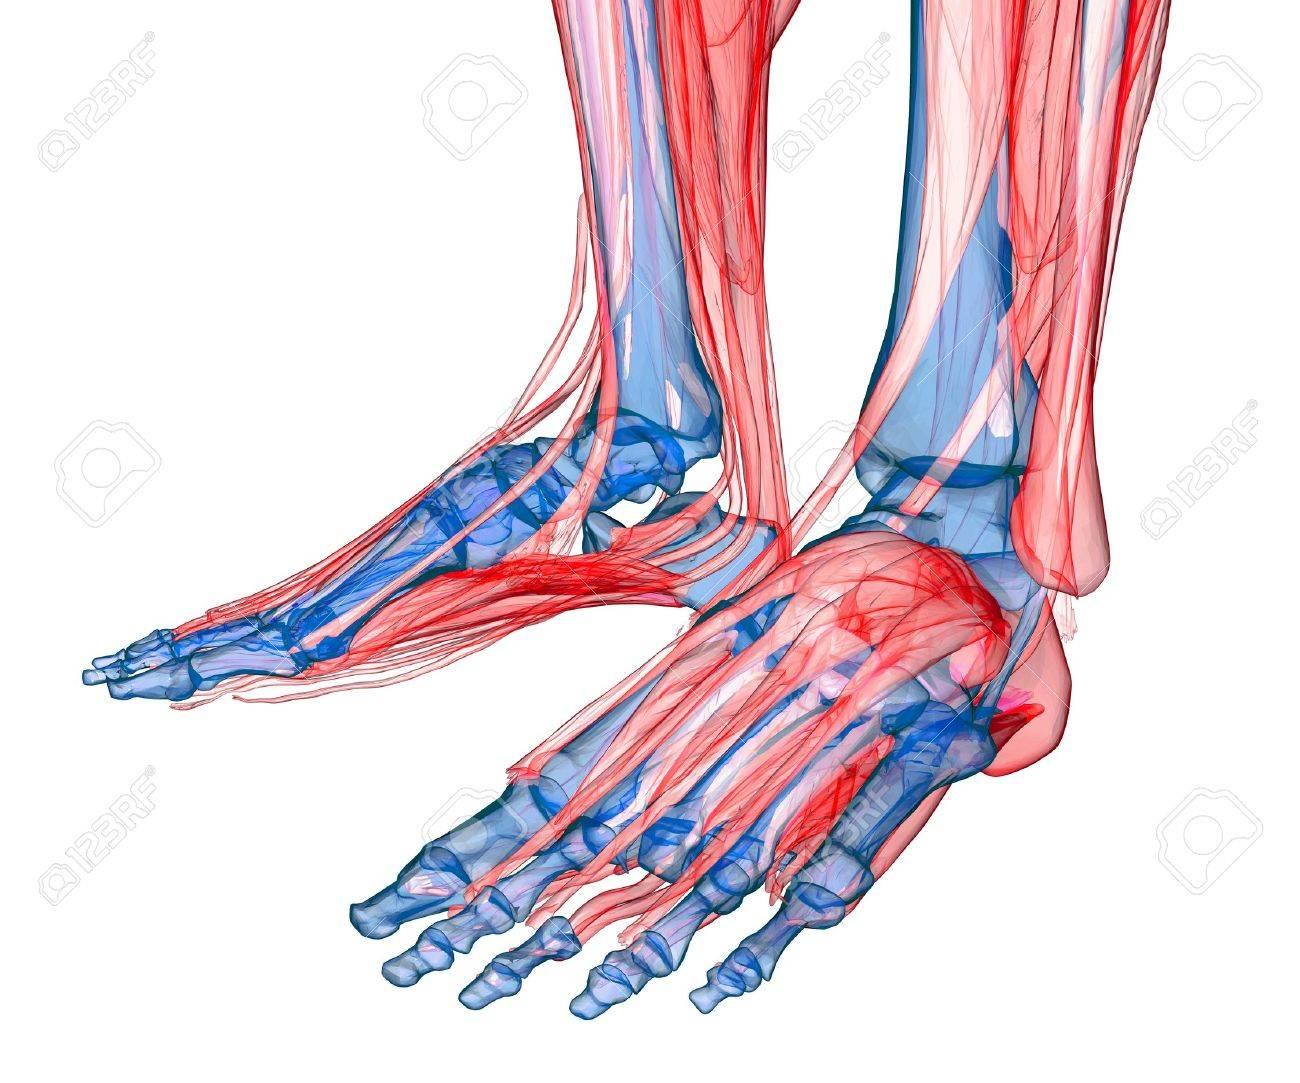 Human feet under X-rays isolated on white Stock Photo - 20929285